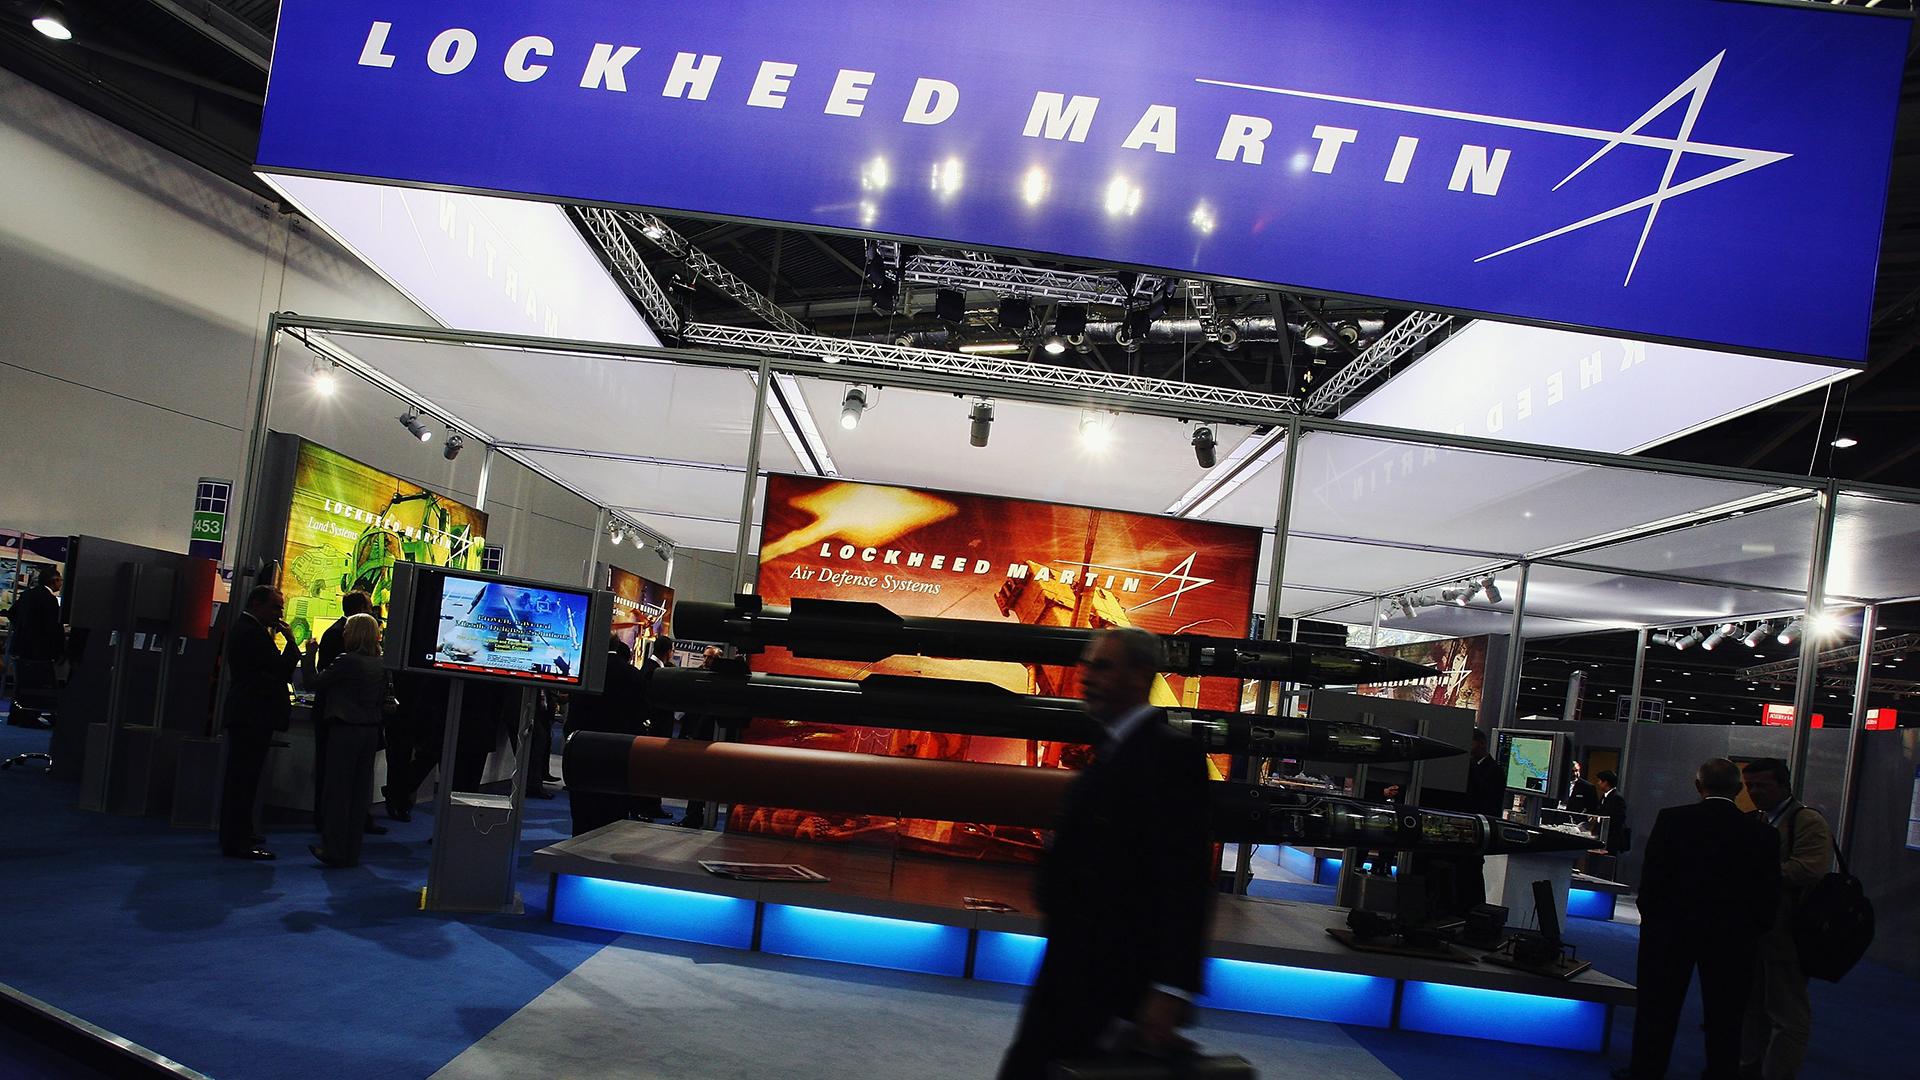 Lockheed Martin trade show display-159532.jpg93778582